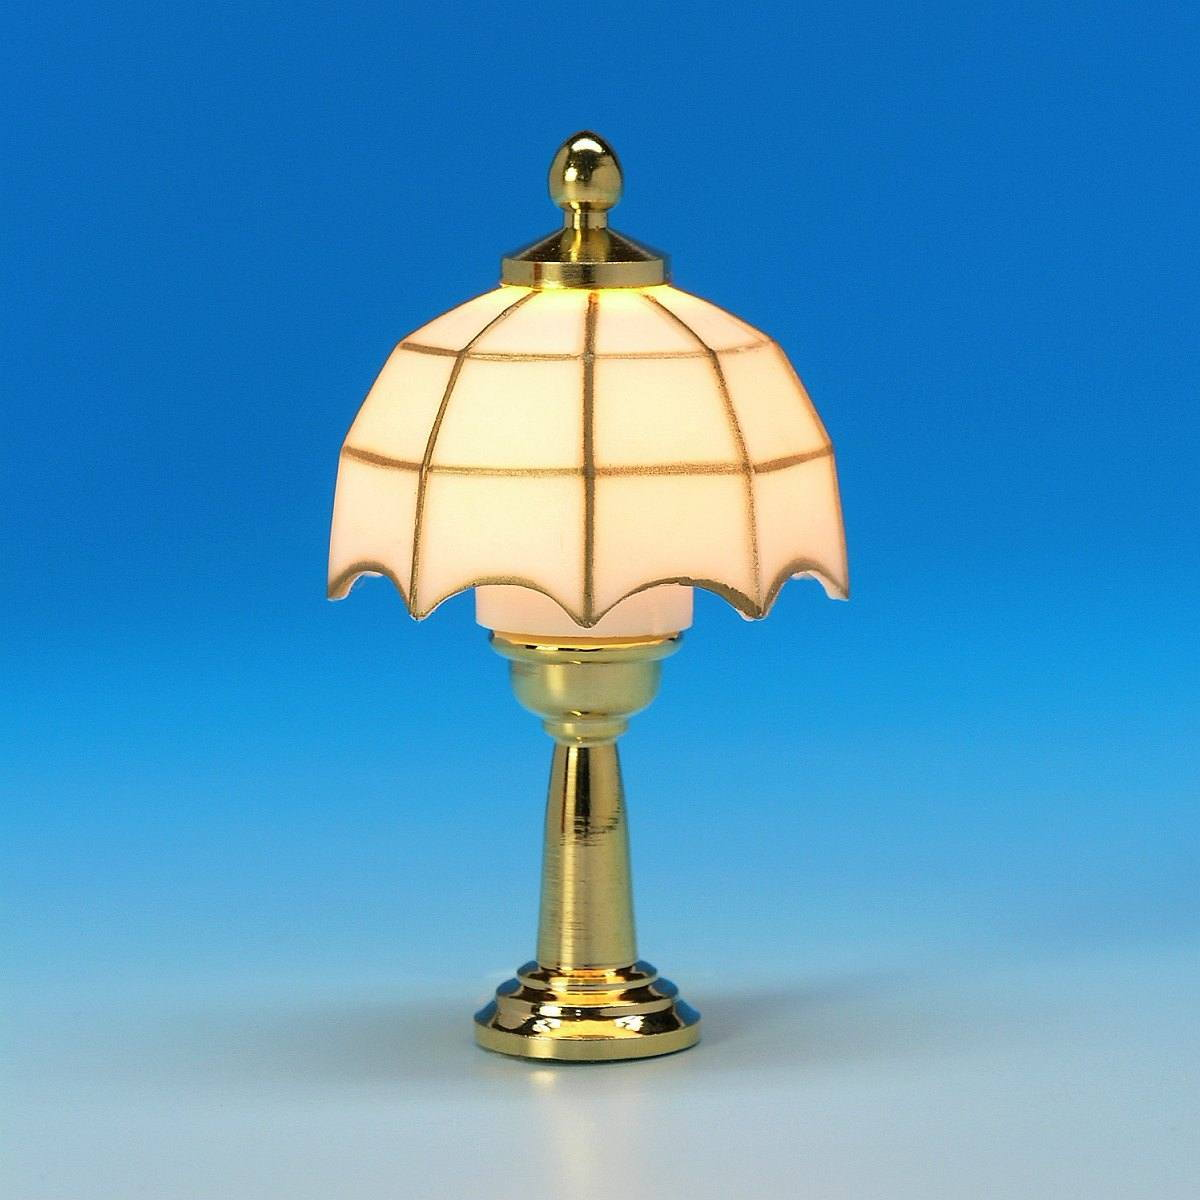 Tiffany Table Lamp, MiniLux